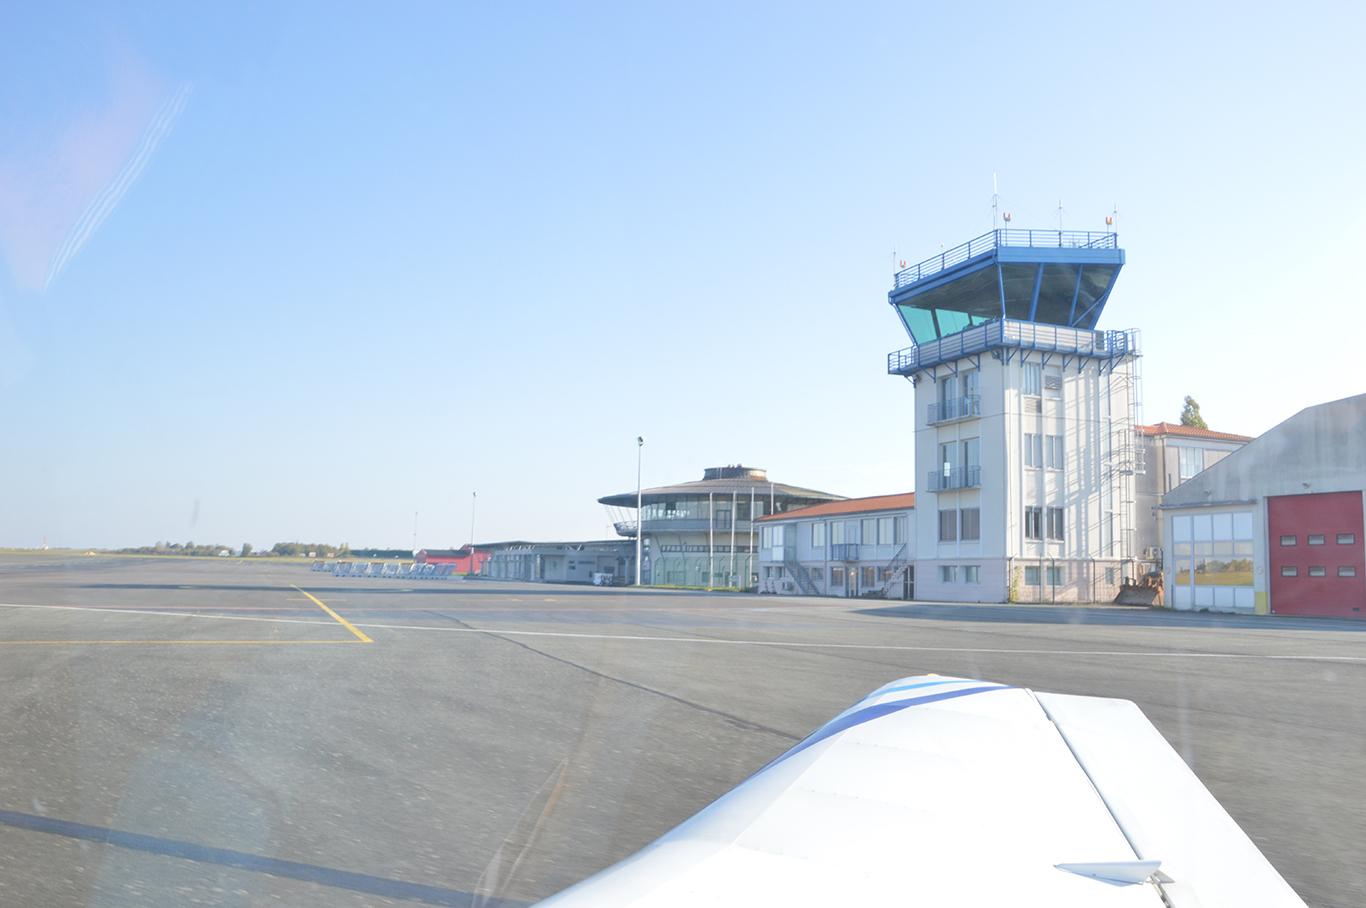 aéroport poitiers